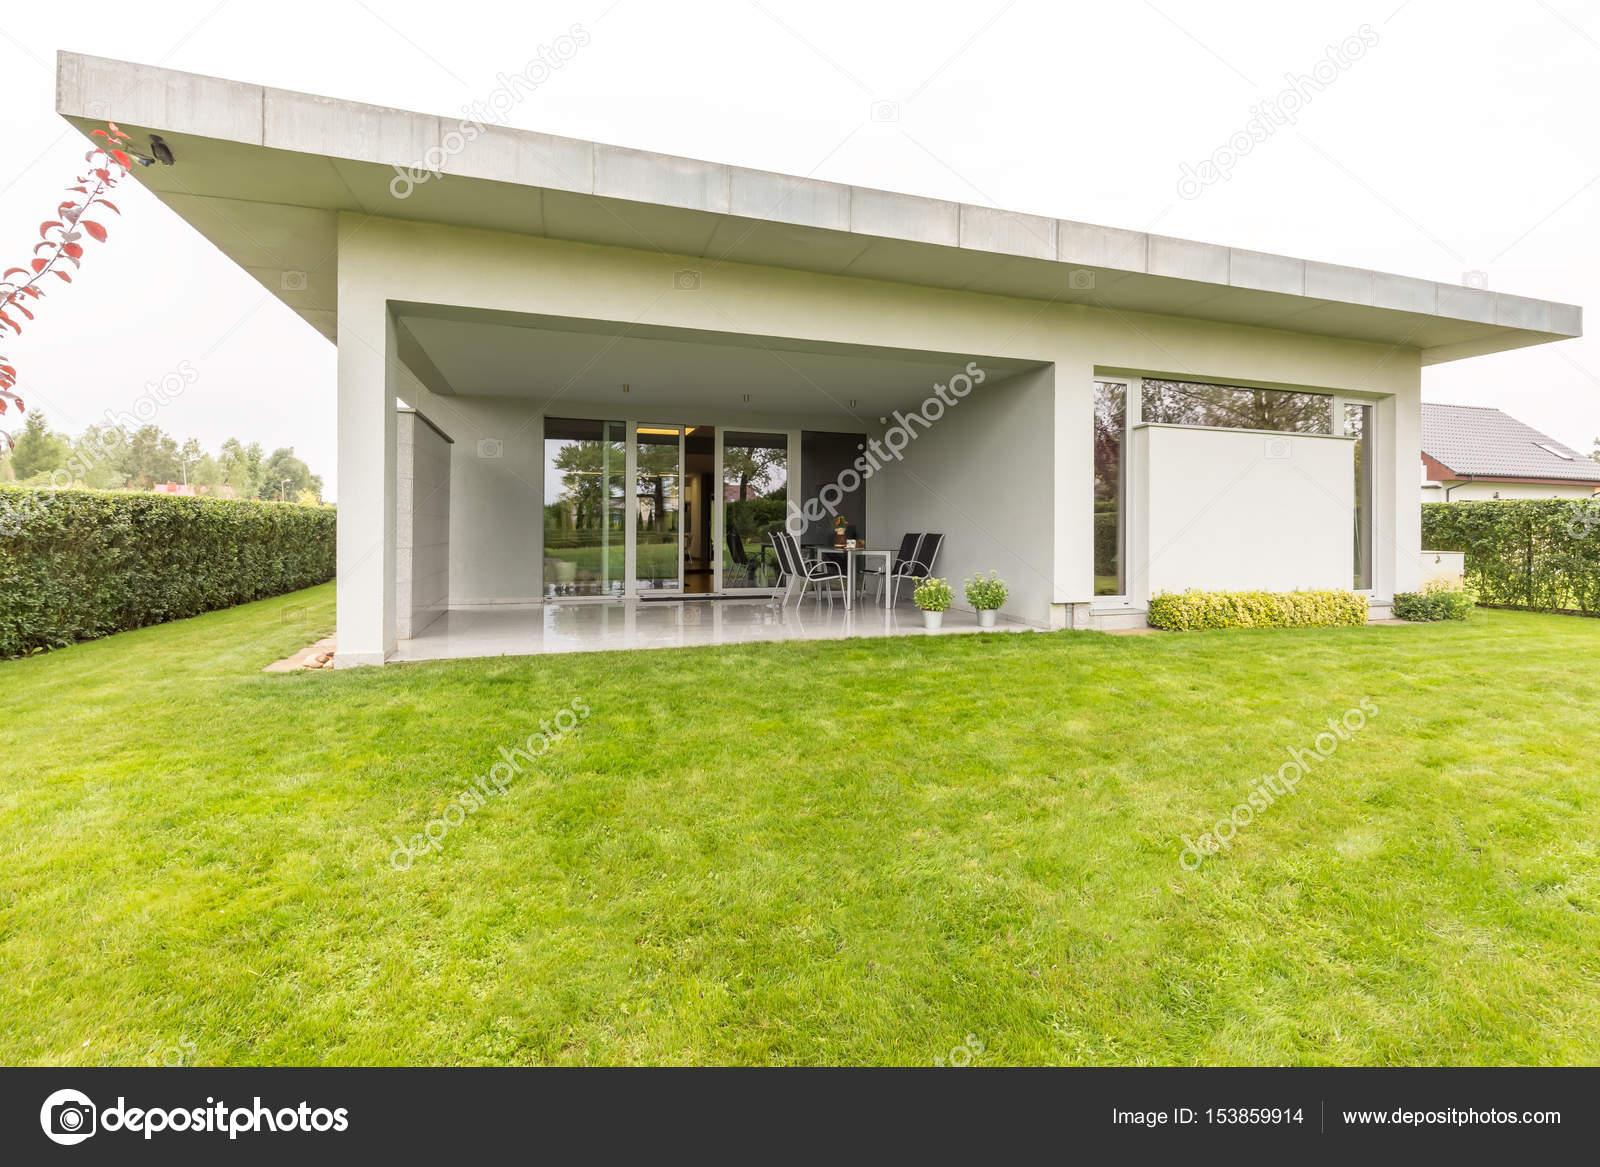 Nettes Einfamilienhaus Im Garten Stockfoto C Photographee Eu